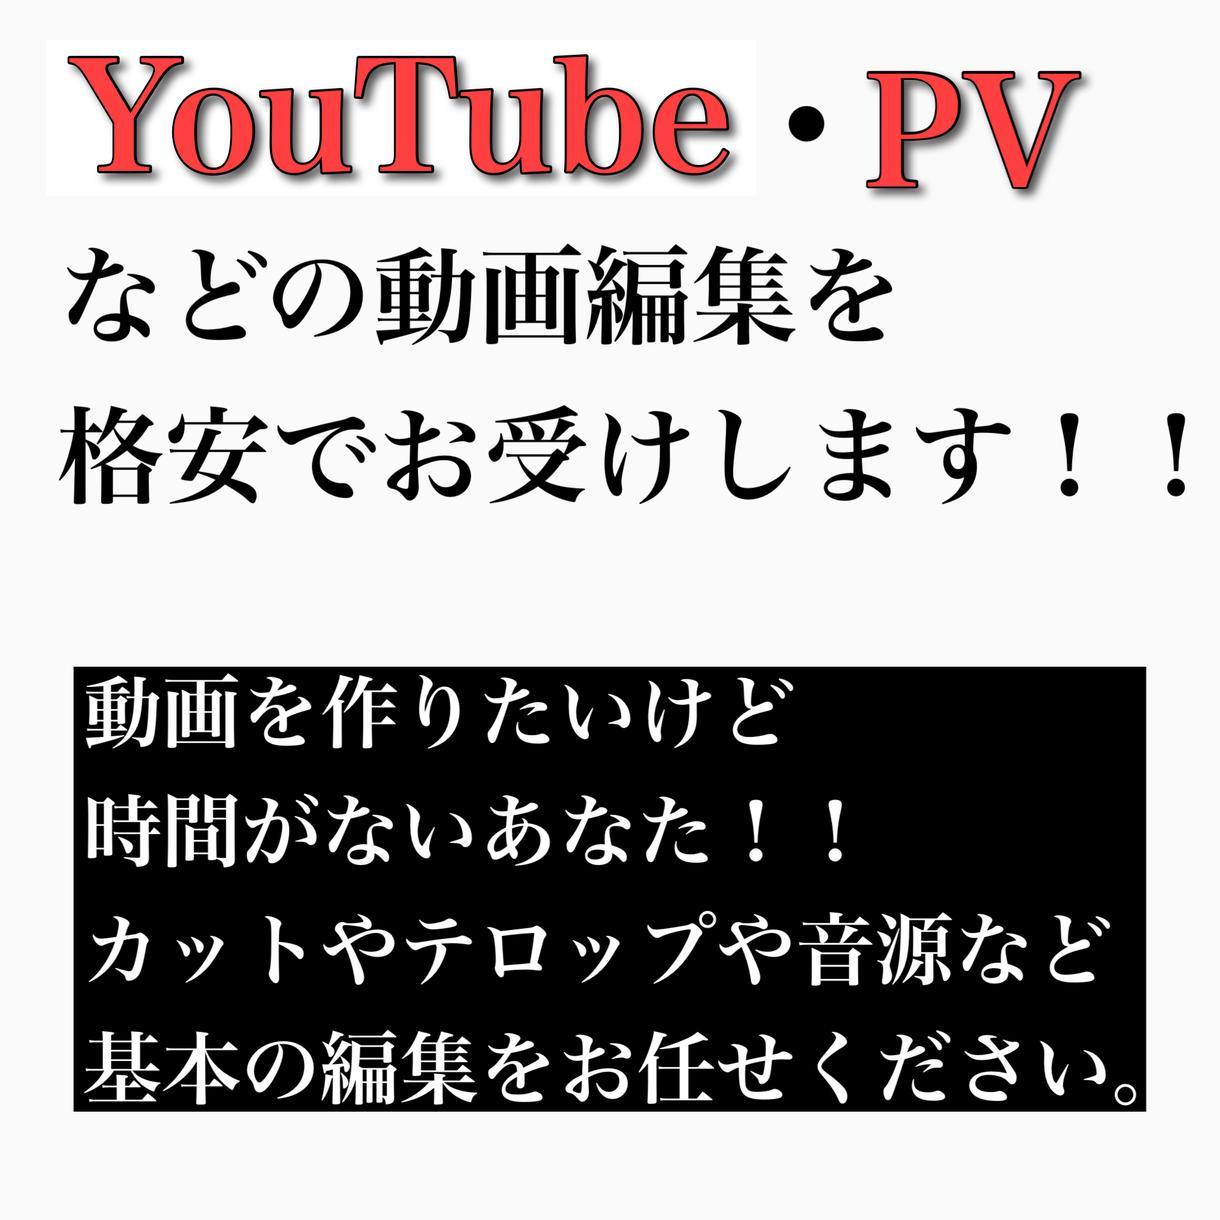 YouTube等の動画編集やります YouTubeのテロップや音源の挿入など。 イメージ1